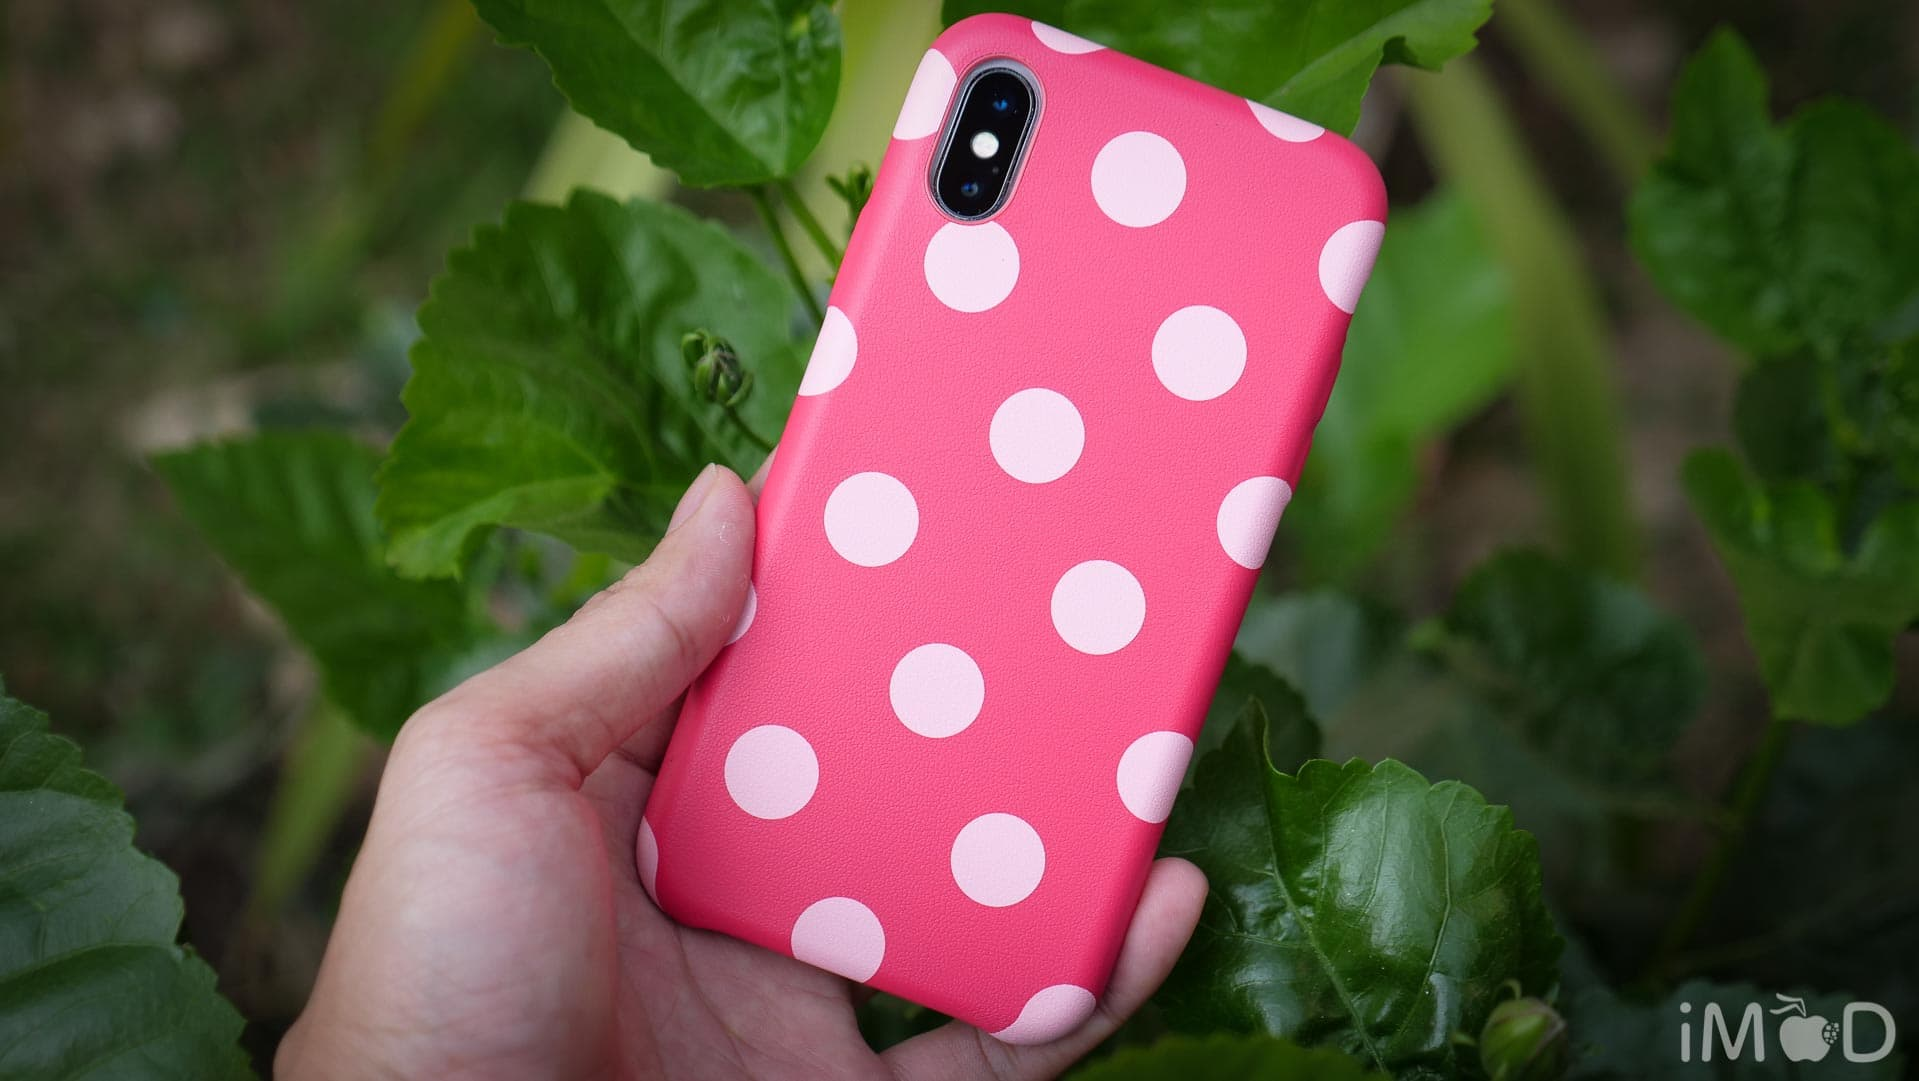 Jtlegend Pokla Leather Case Iphone X 8625